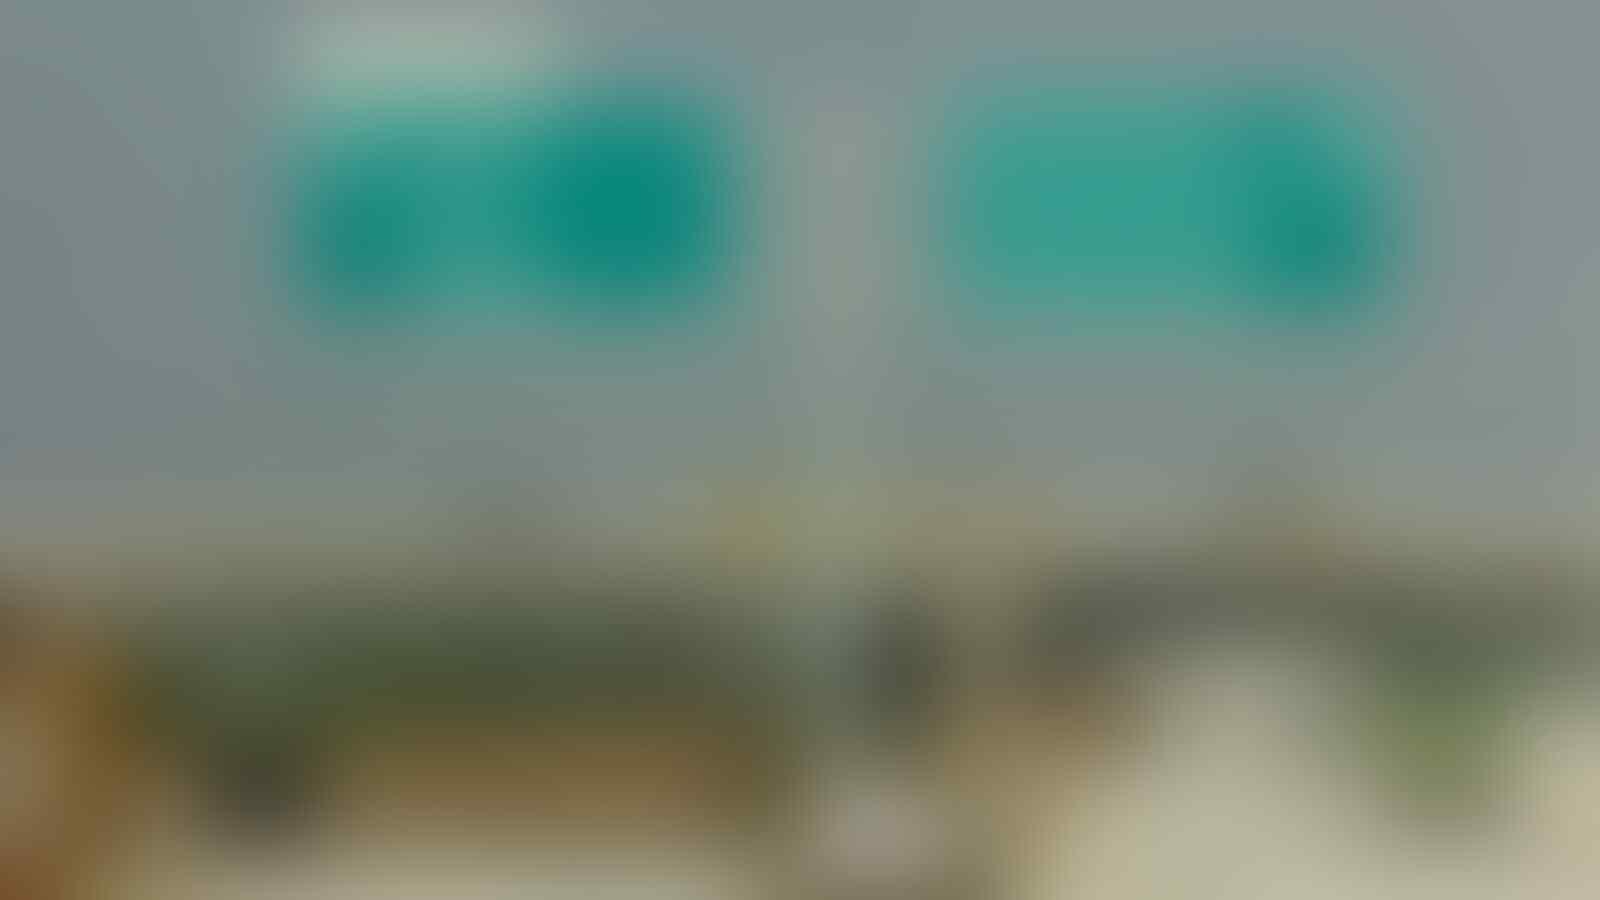 Mudik Jakarta-Surabaya Lewat Tol, Siapkan Saldo e-Toll Rp 330.000